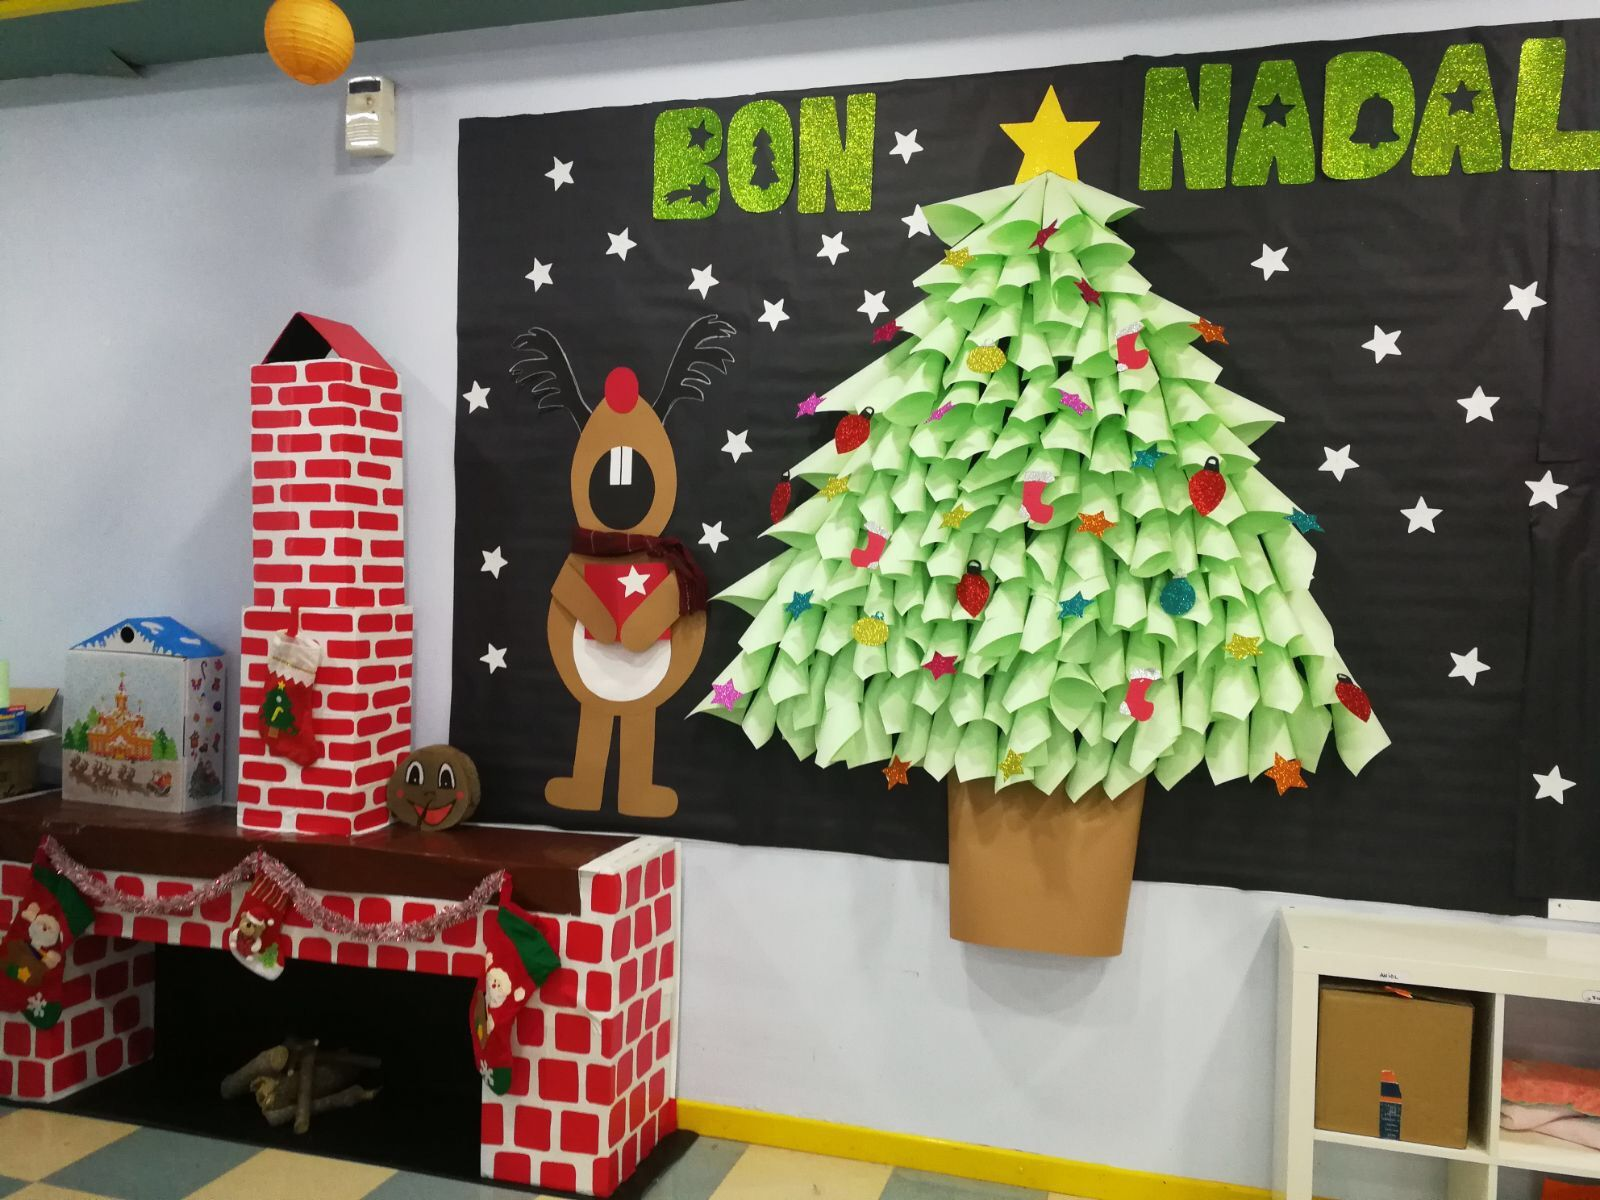 Mural de navidad para infantil chimenea de cart n y rbol for Decorar puertas navidad infantil